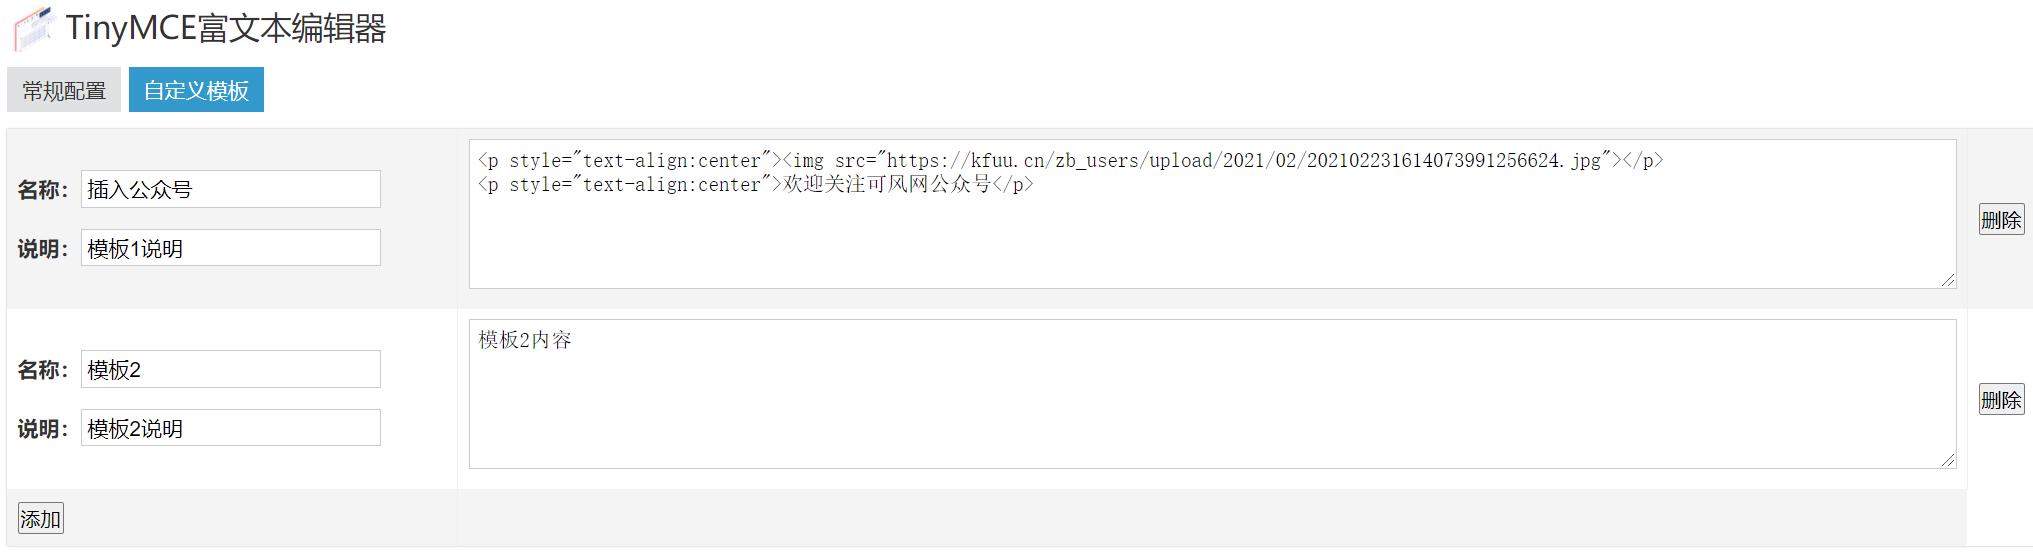 Zblog TinyMCE 富文本编辑器,zblog,第5张